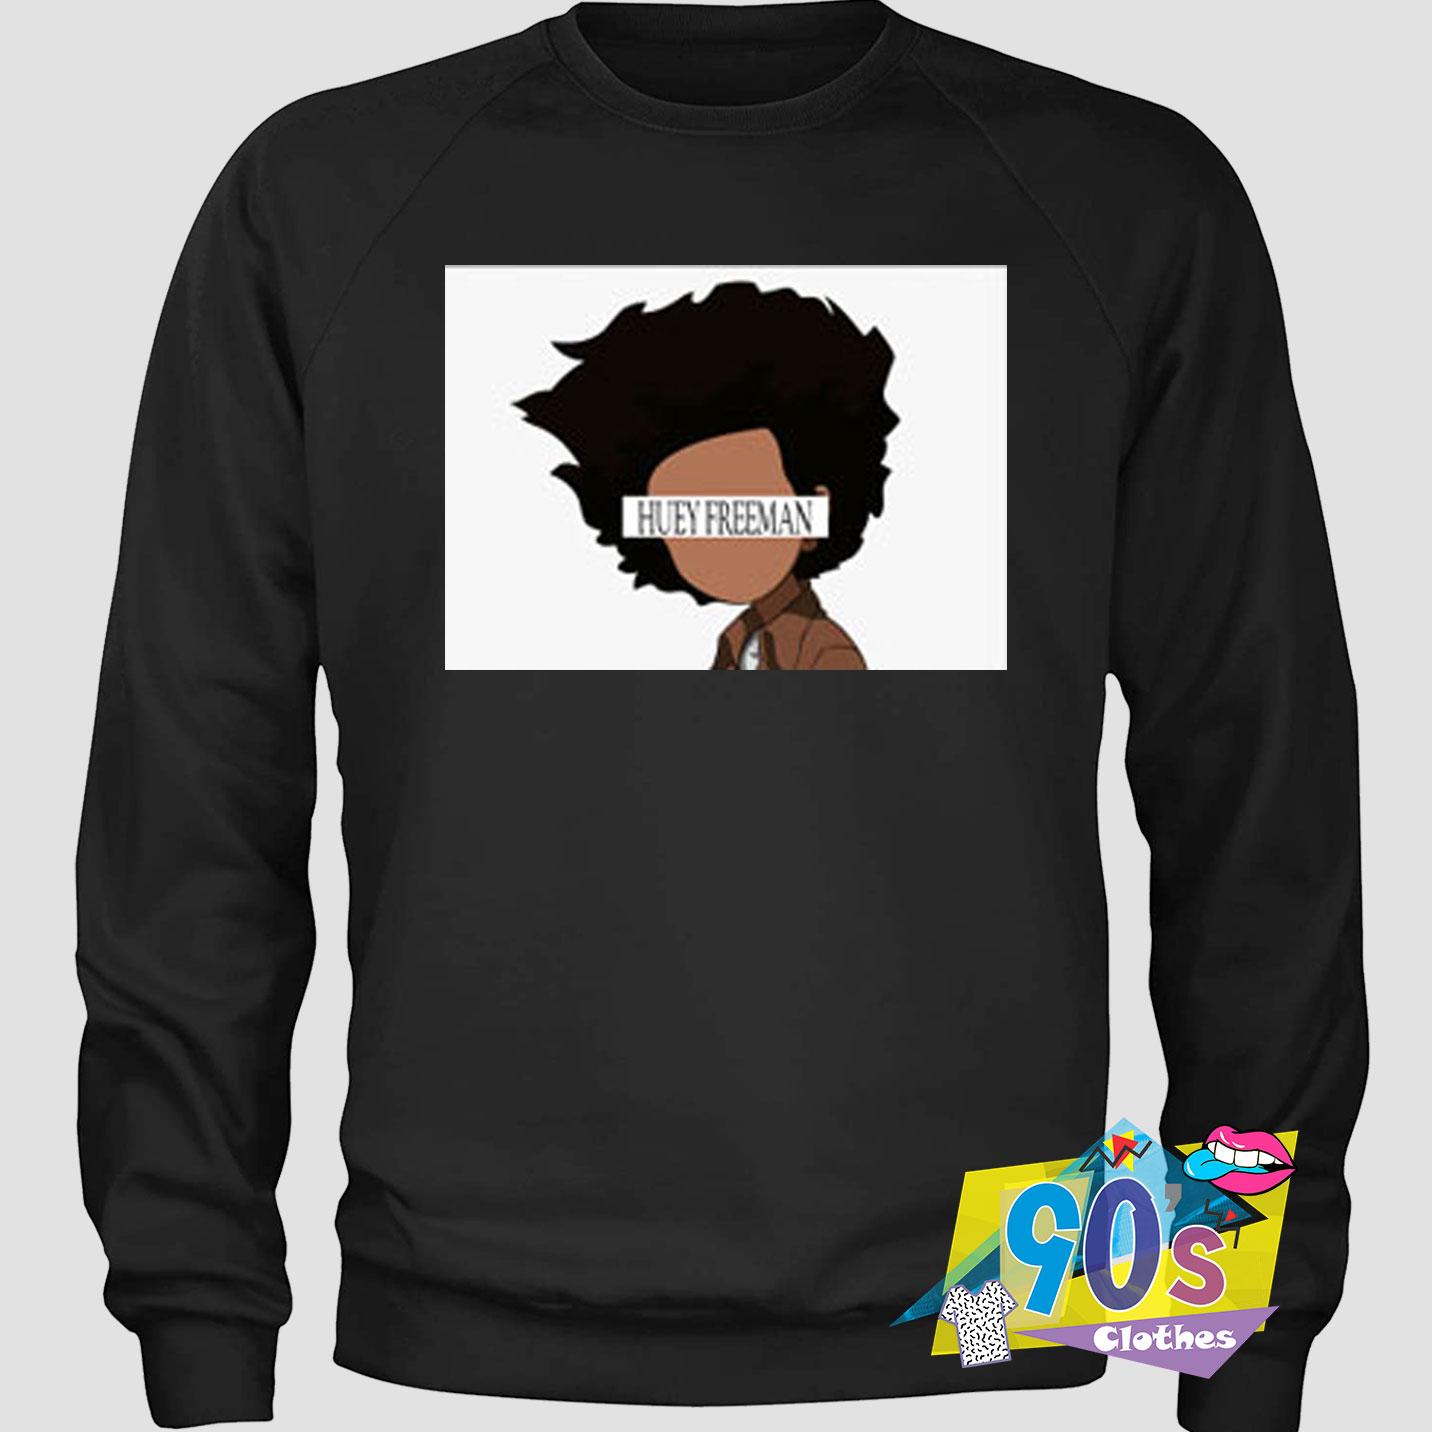 Faceless Huey Freeman The Boondocks Sweatshirt 90sclothes Com [ 1432 x 1432 Pixel ]